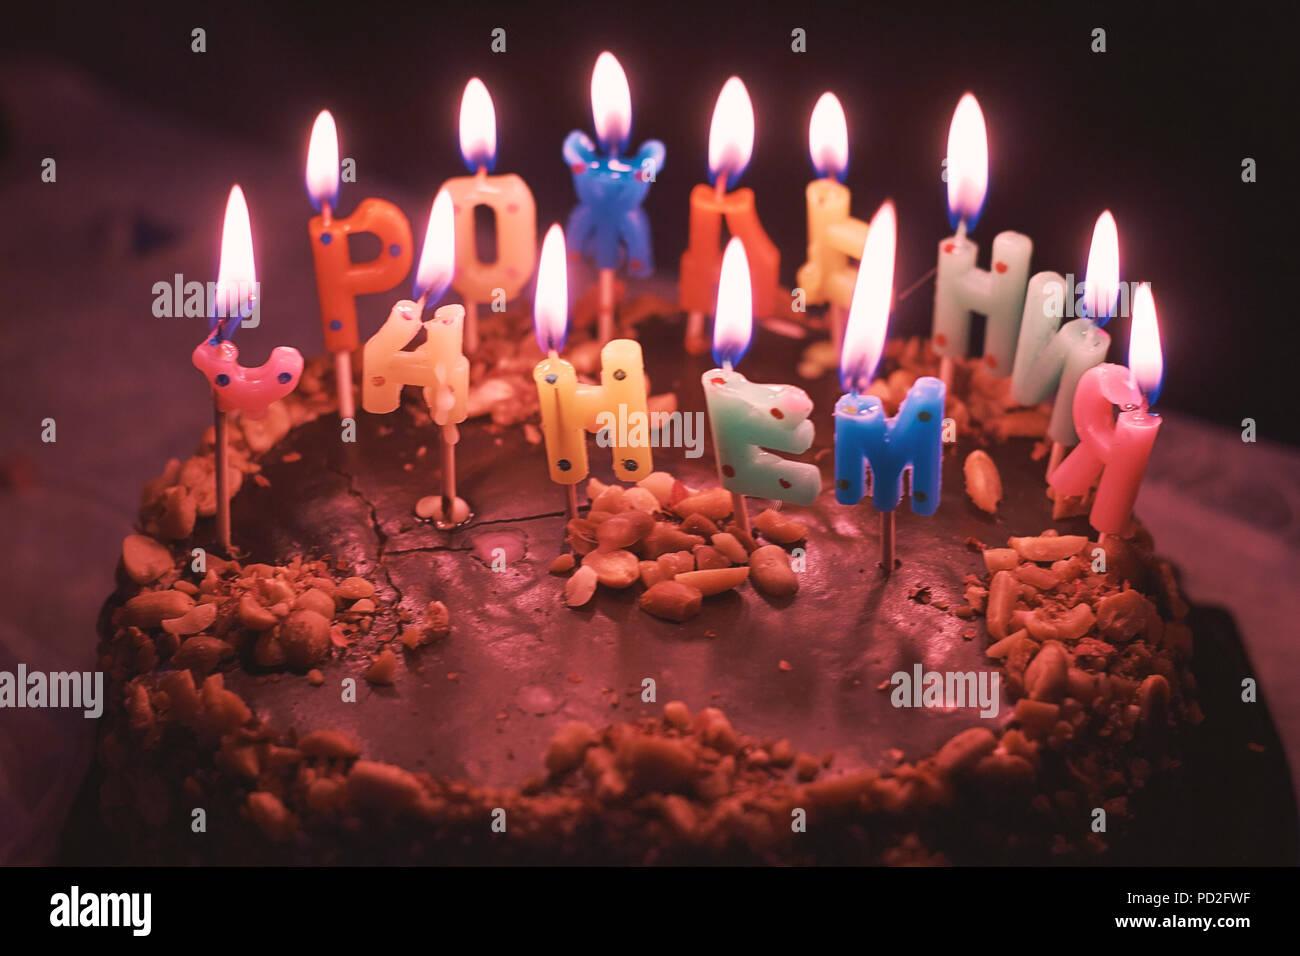 Delicious Childrens Chocolate Birthday Cake